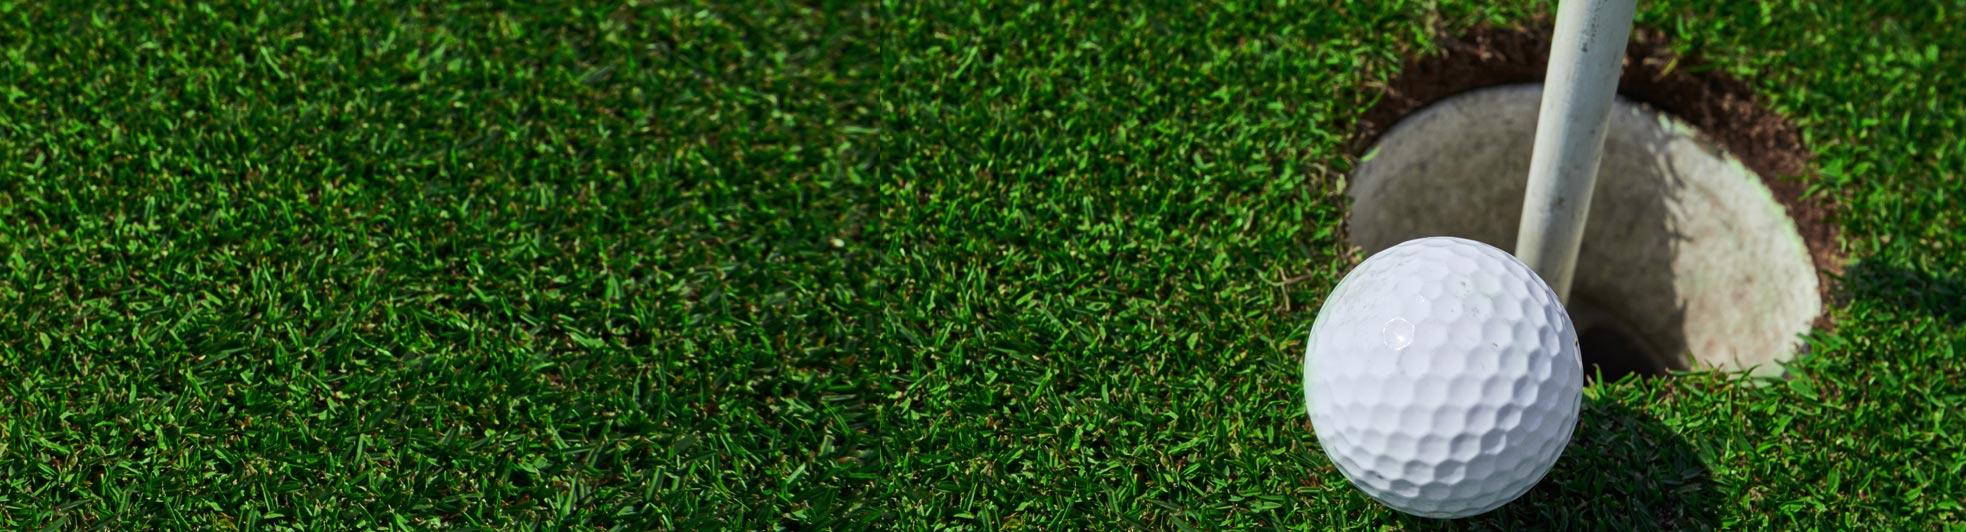 Club De Golf St Francois De Laval Club De Golf St Francois De Laval